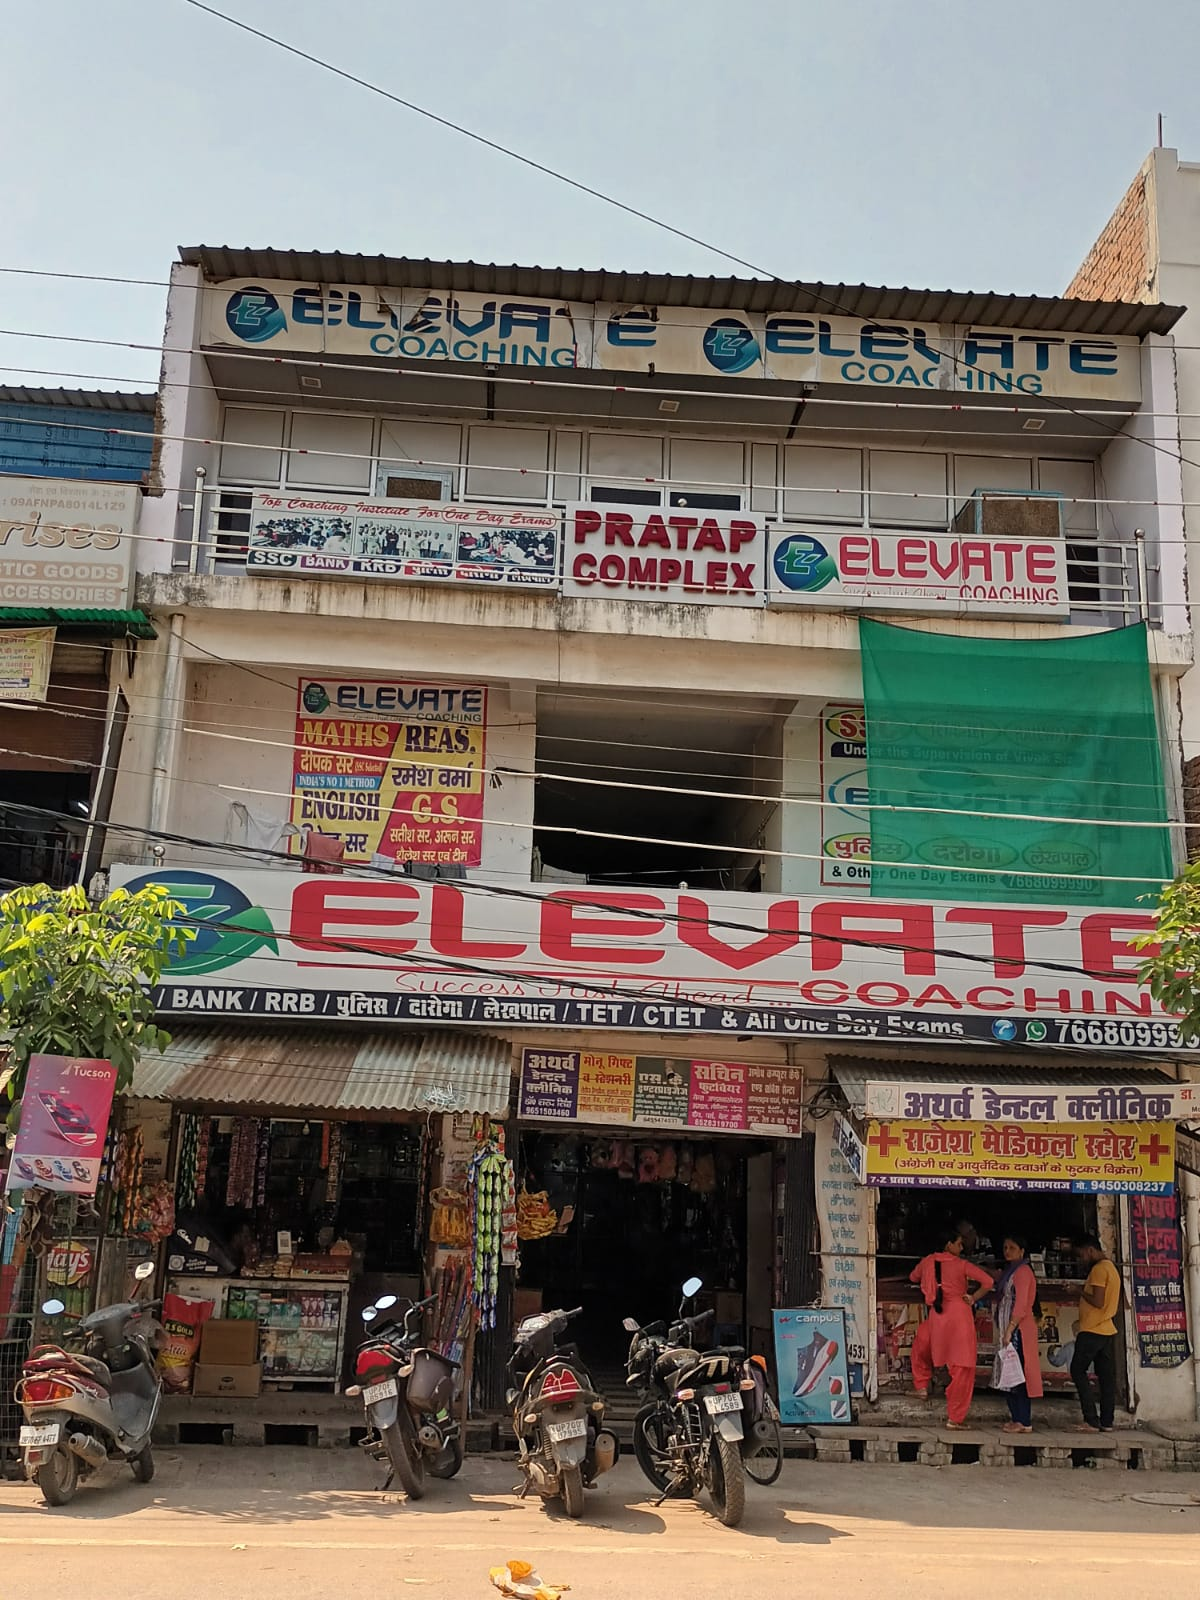 ELEVATE COACHING Logo